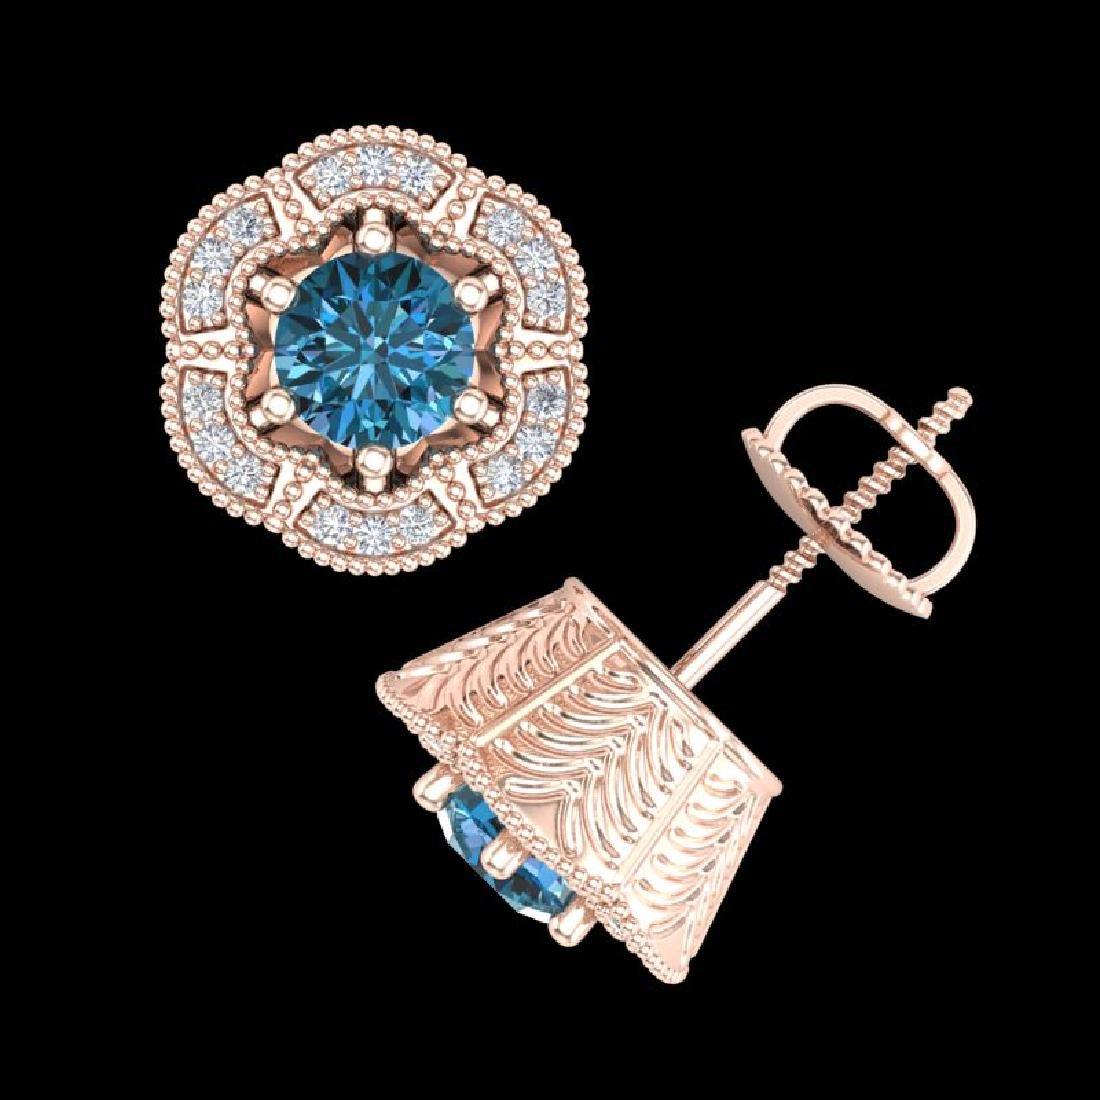 1.51 CTW Fancy Intense Blue Diamond Art Deco Stud - 3